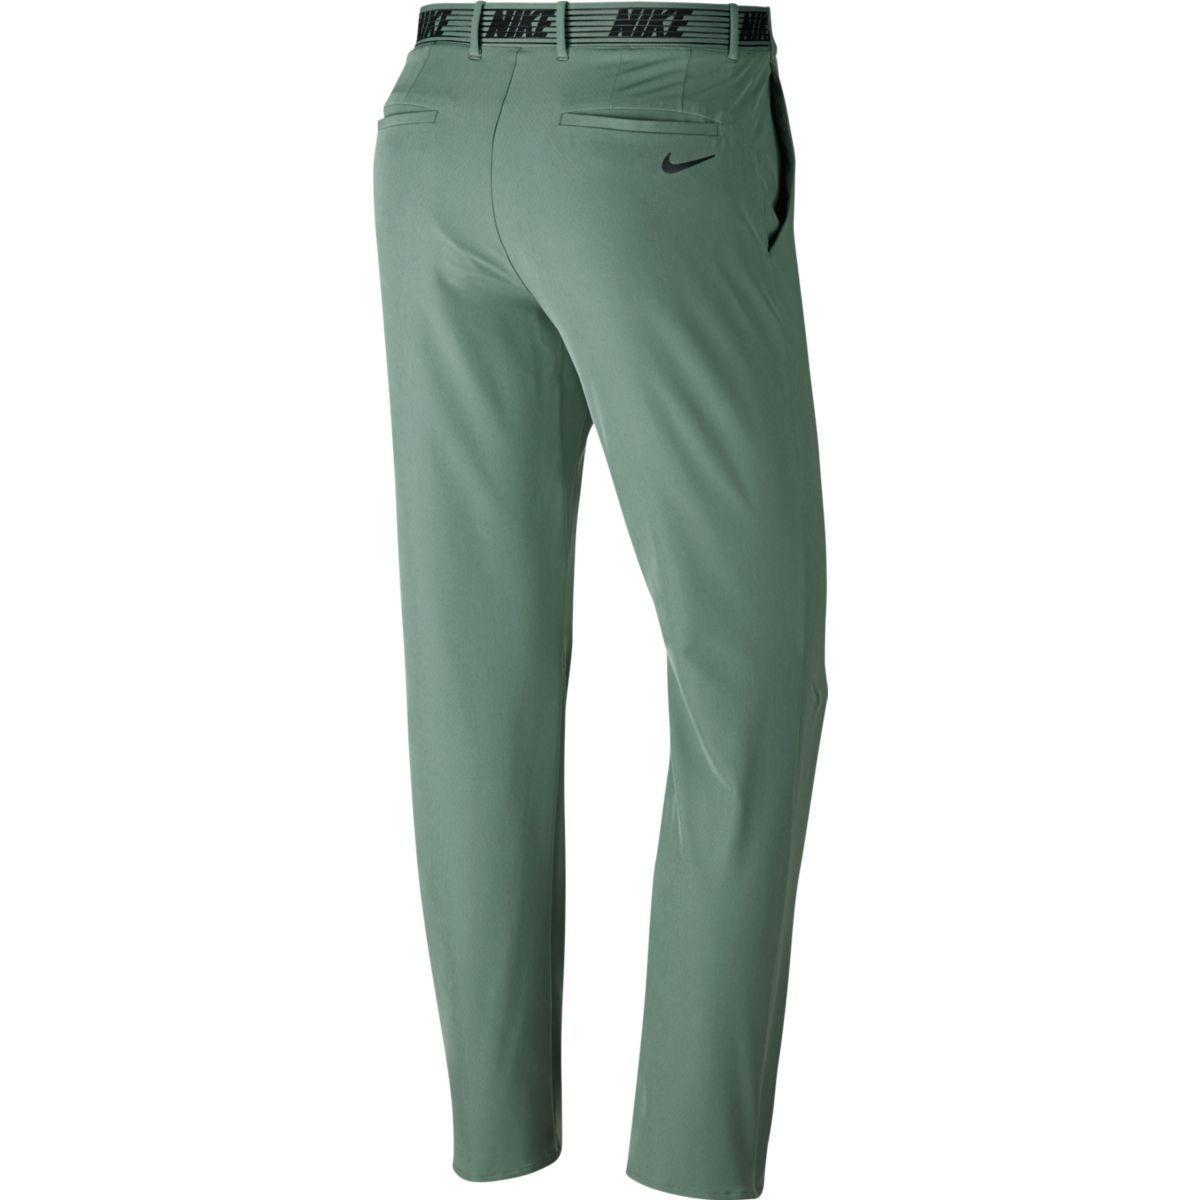 Nike Slim Flex Golf Pants 891887